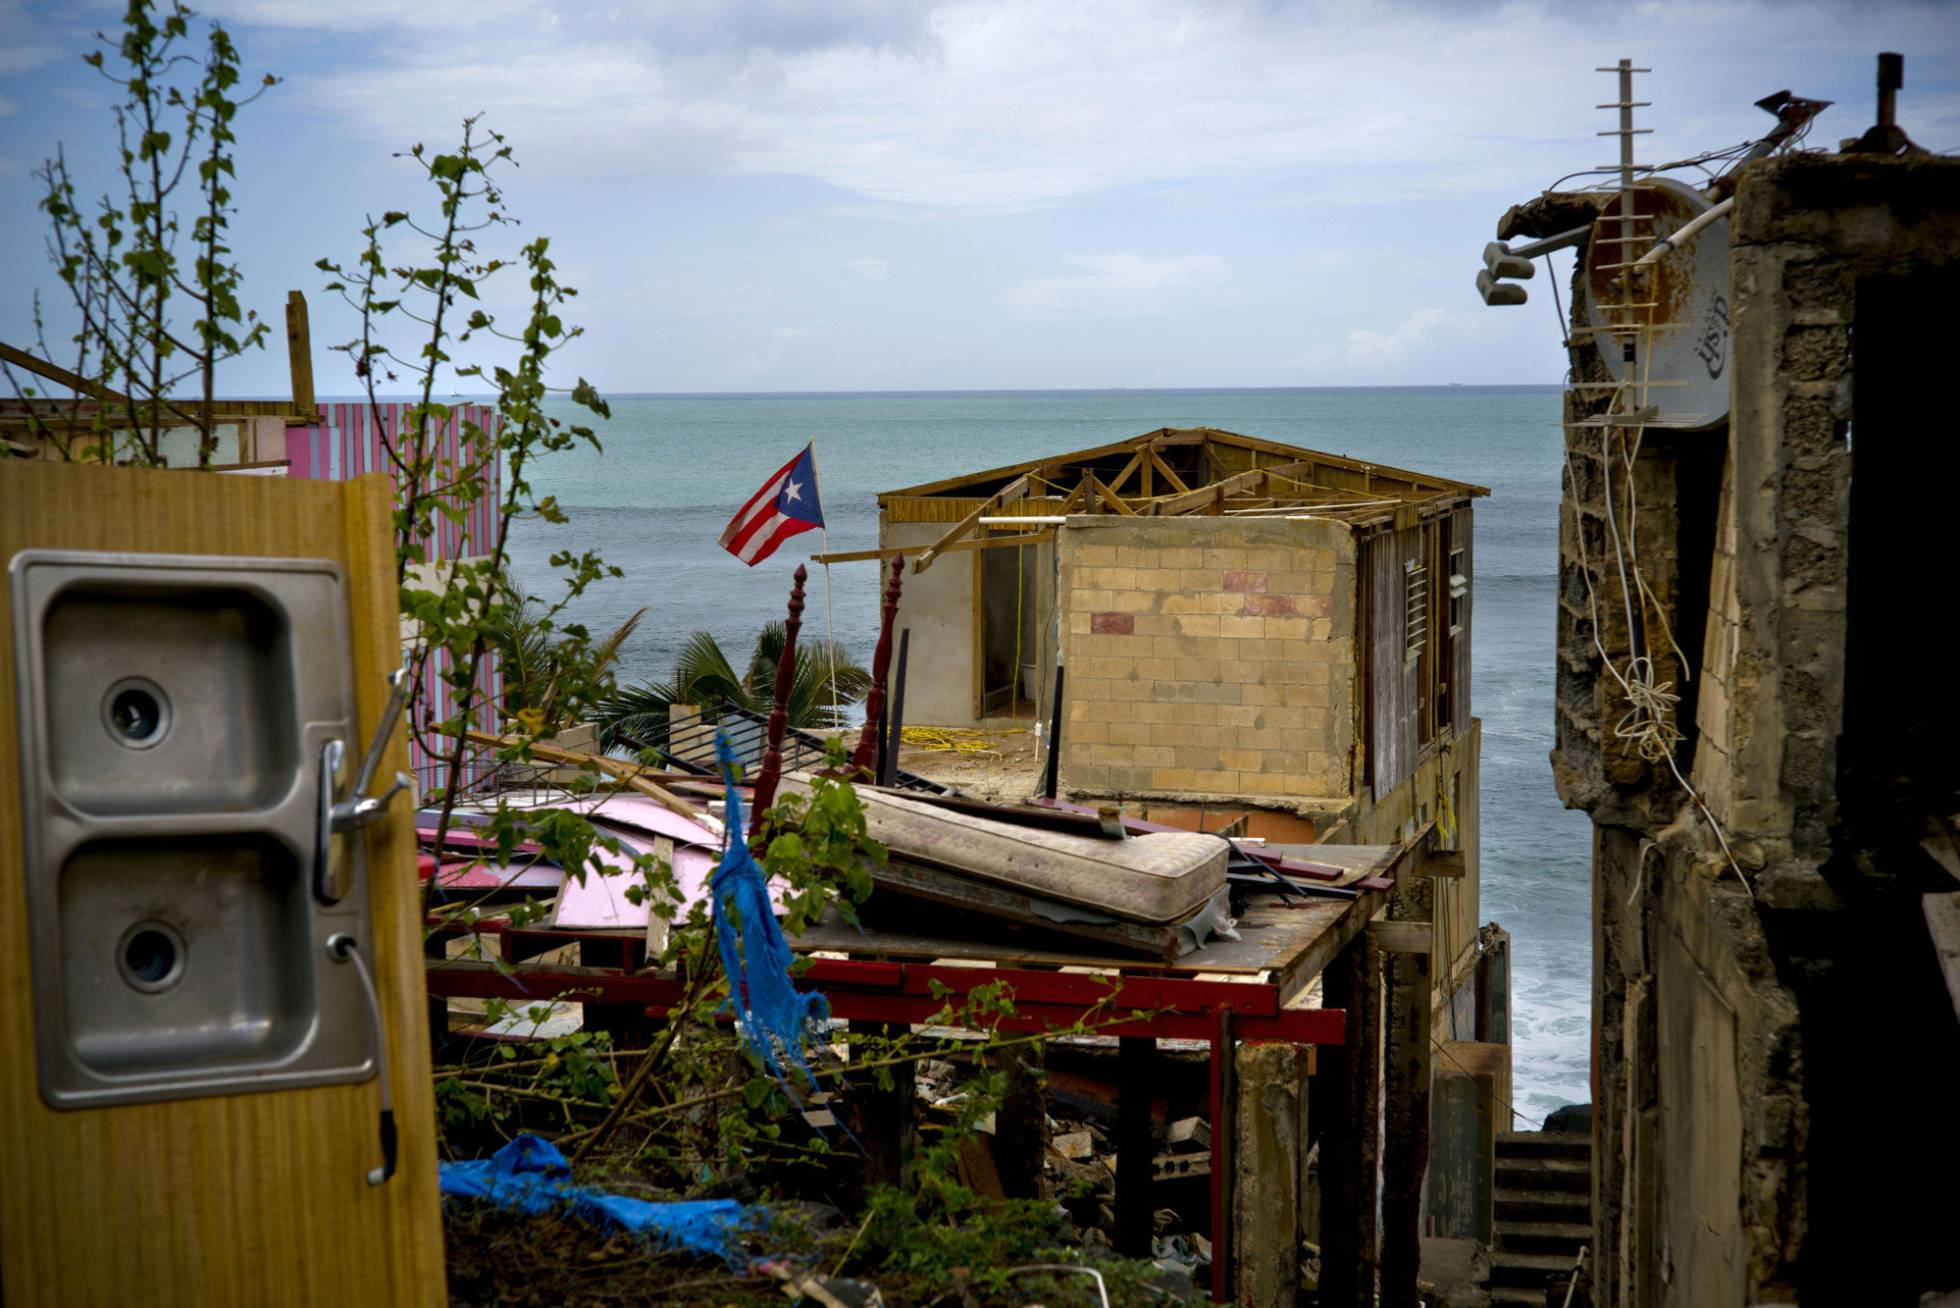 1 viviendas destrozadas puerto rico